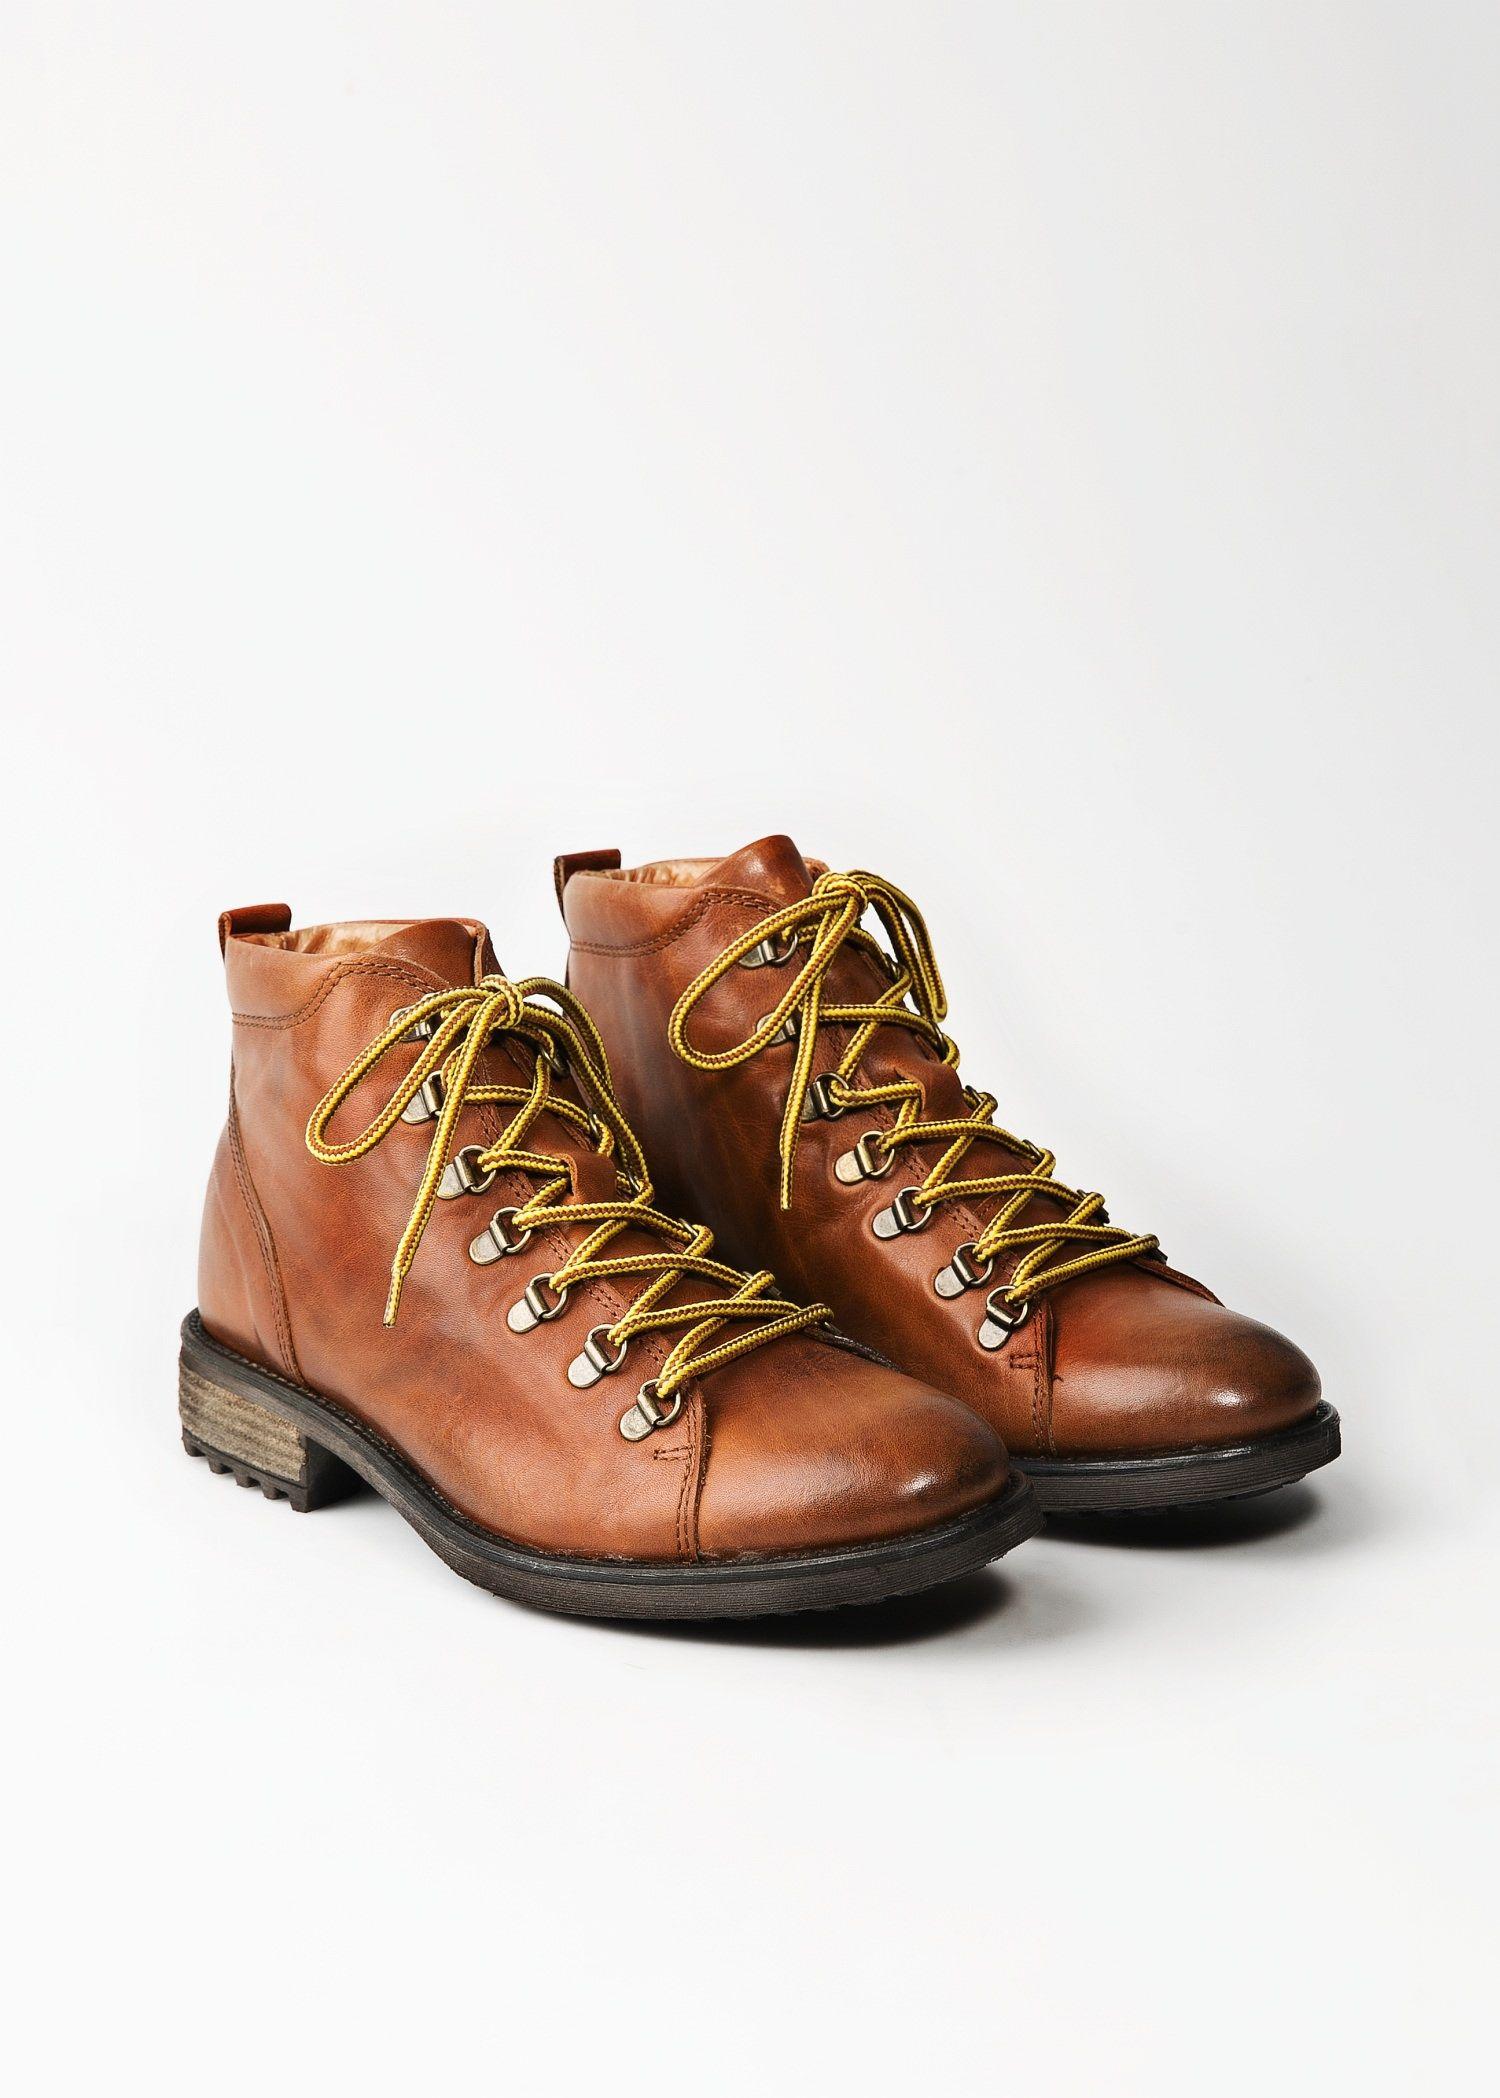 Skorzane Polbuty Worker Mezczyzna Mango Man Polska Worker Boots Boots Shoe Boots